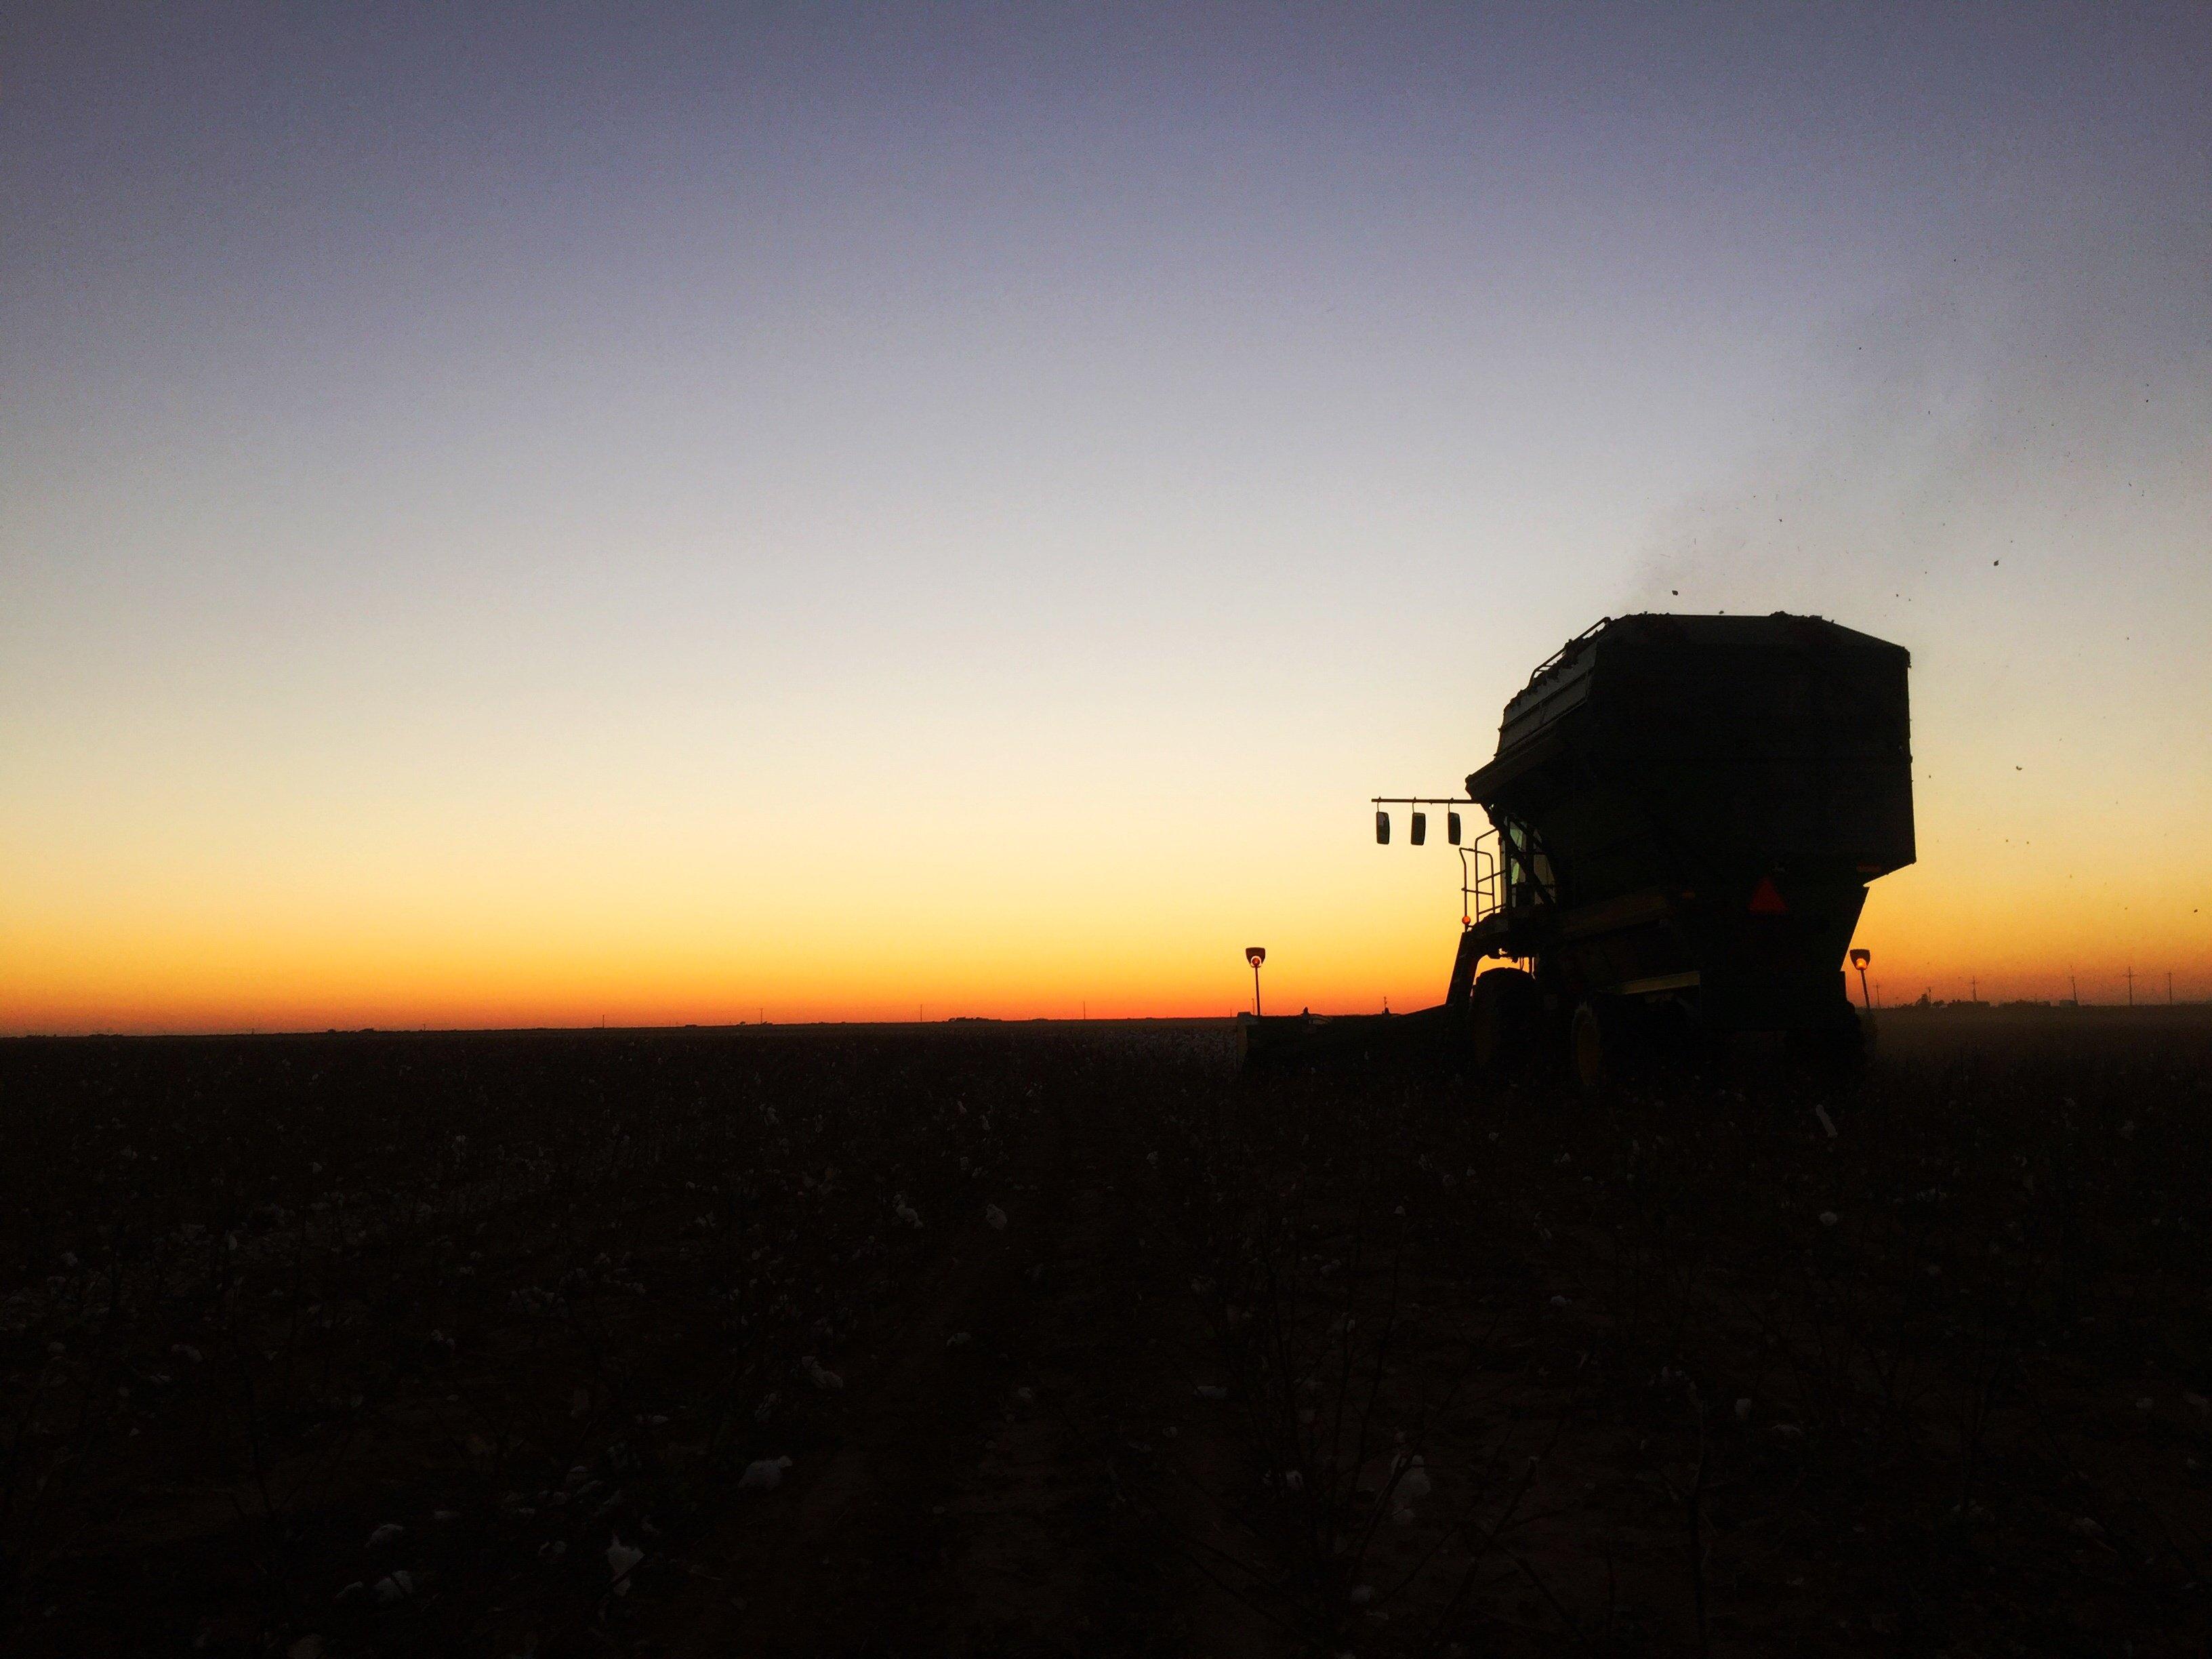 Sunset on the farm